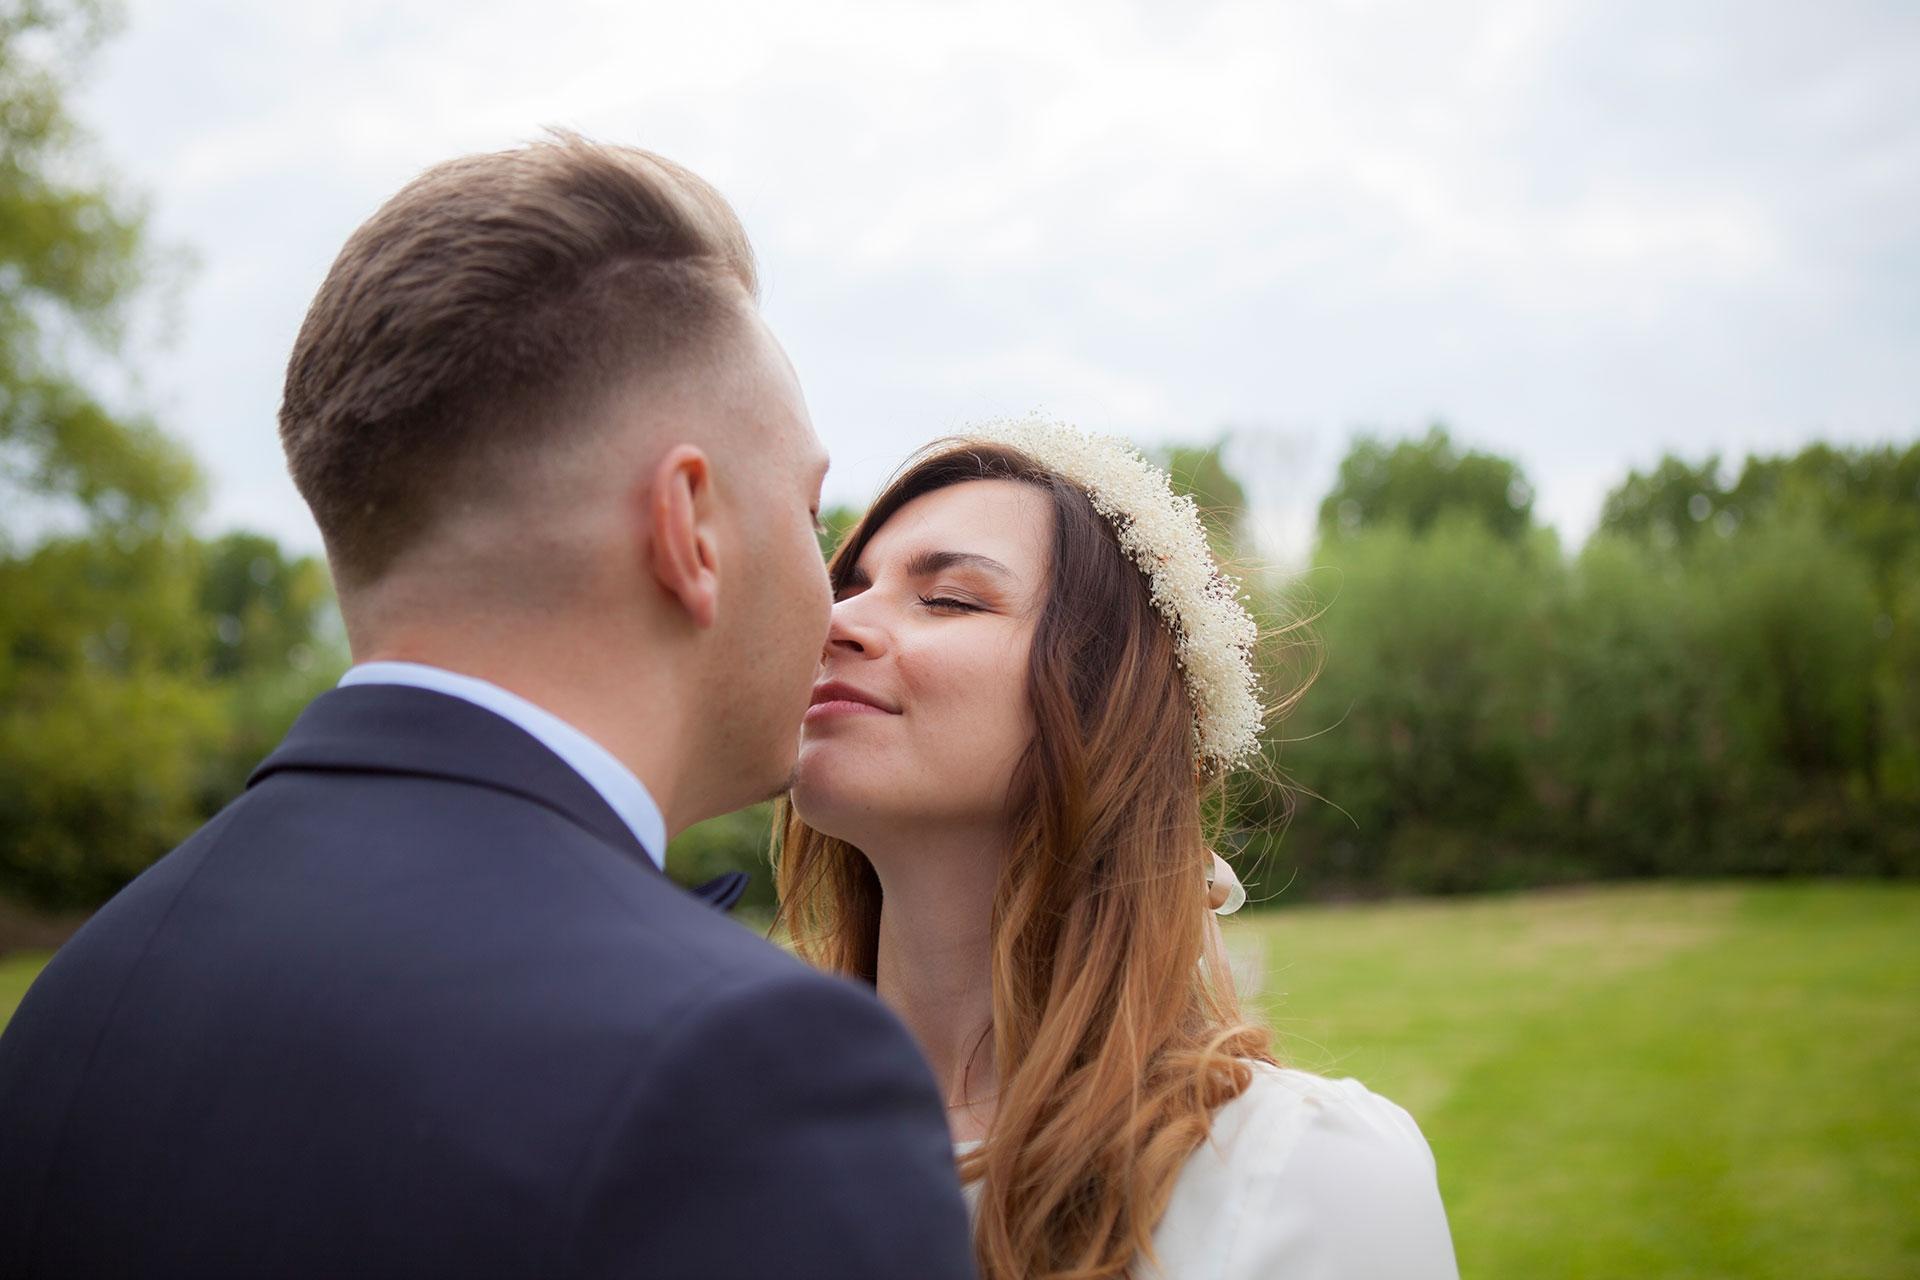 particuliers-evenements-mariages-oui-zelie&valentin-20